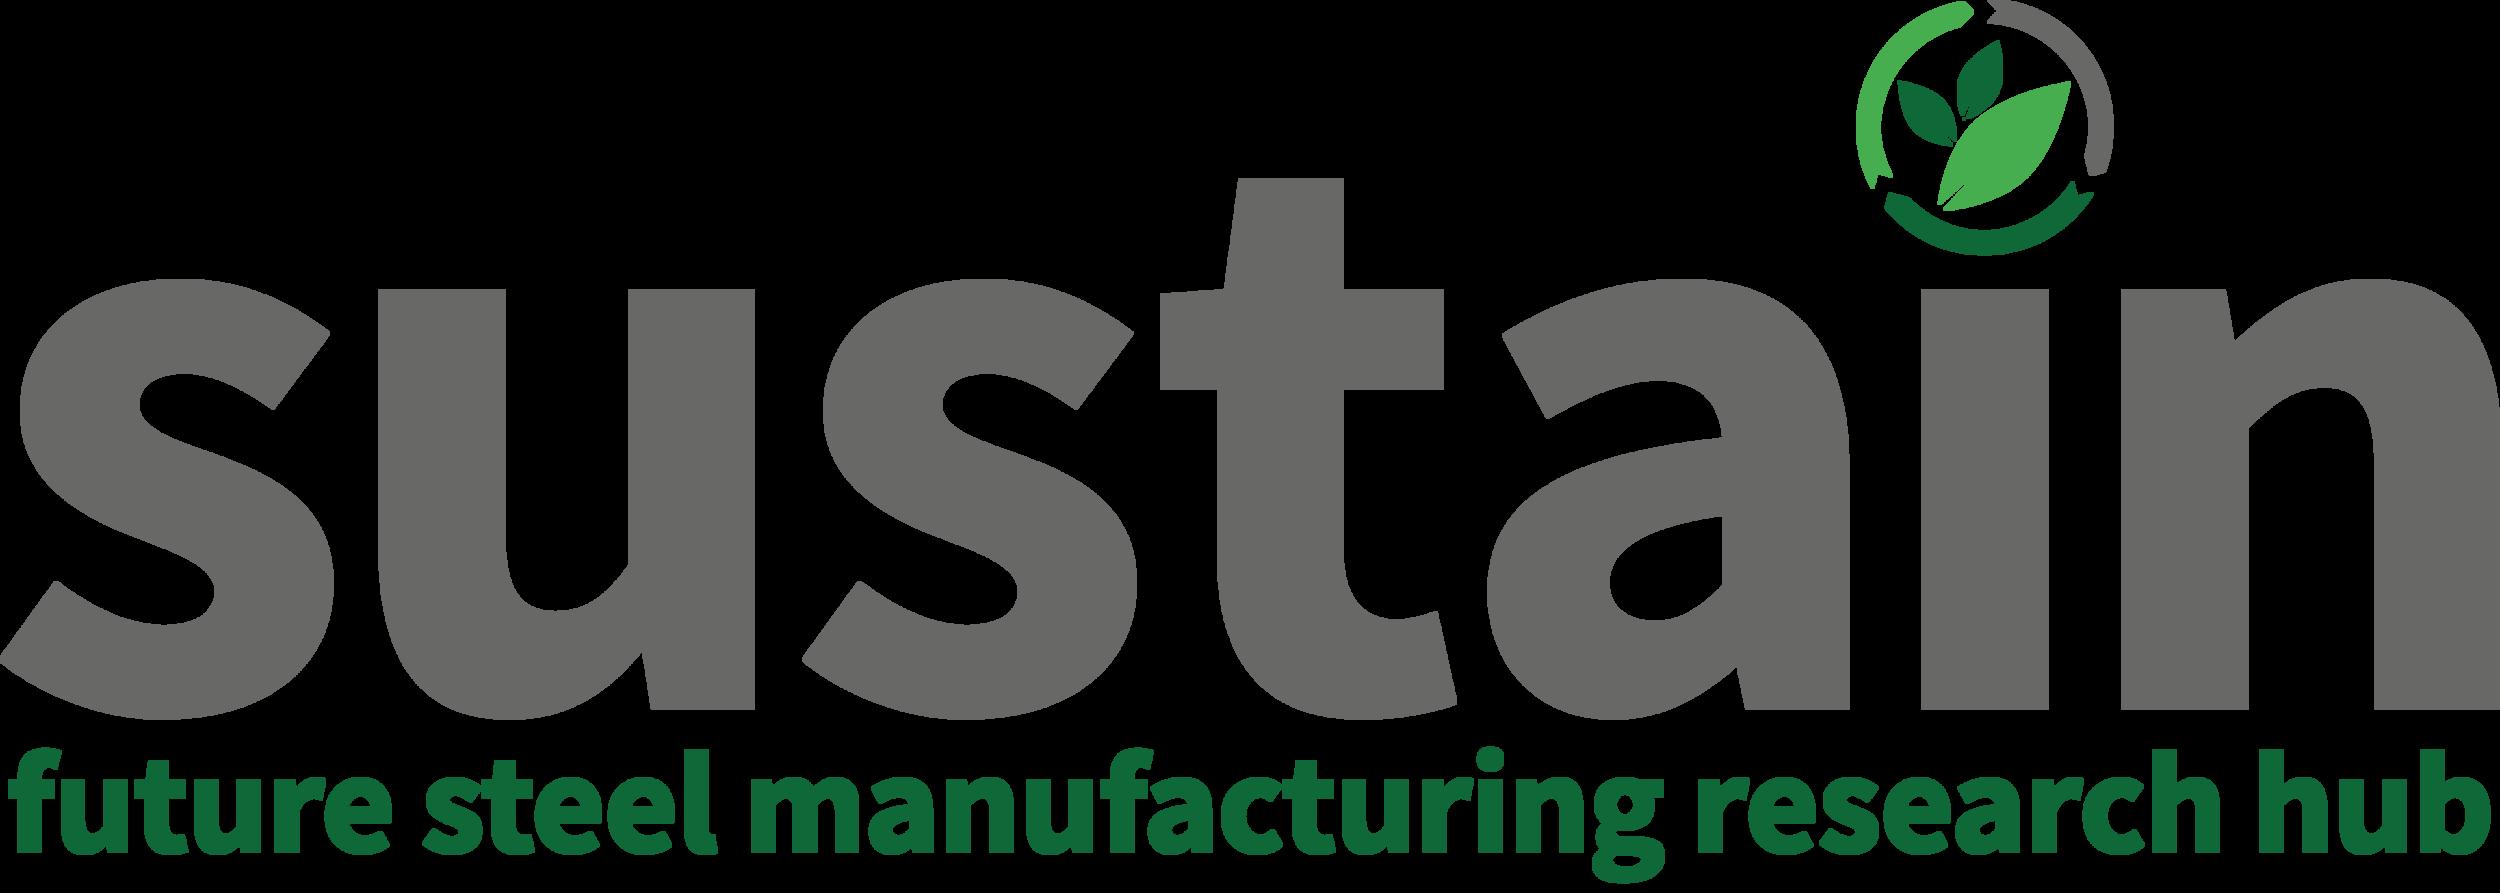 SUSTAIN Steel - EPSRC Future Steel Manufacturing Research Hub — SUSTAIN  Rebrand